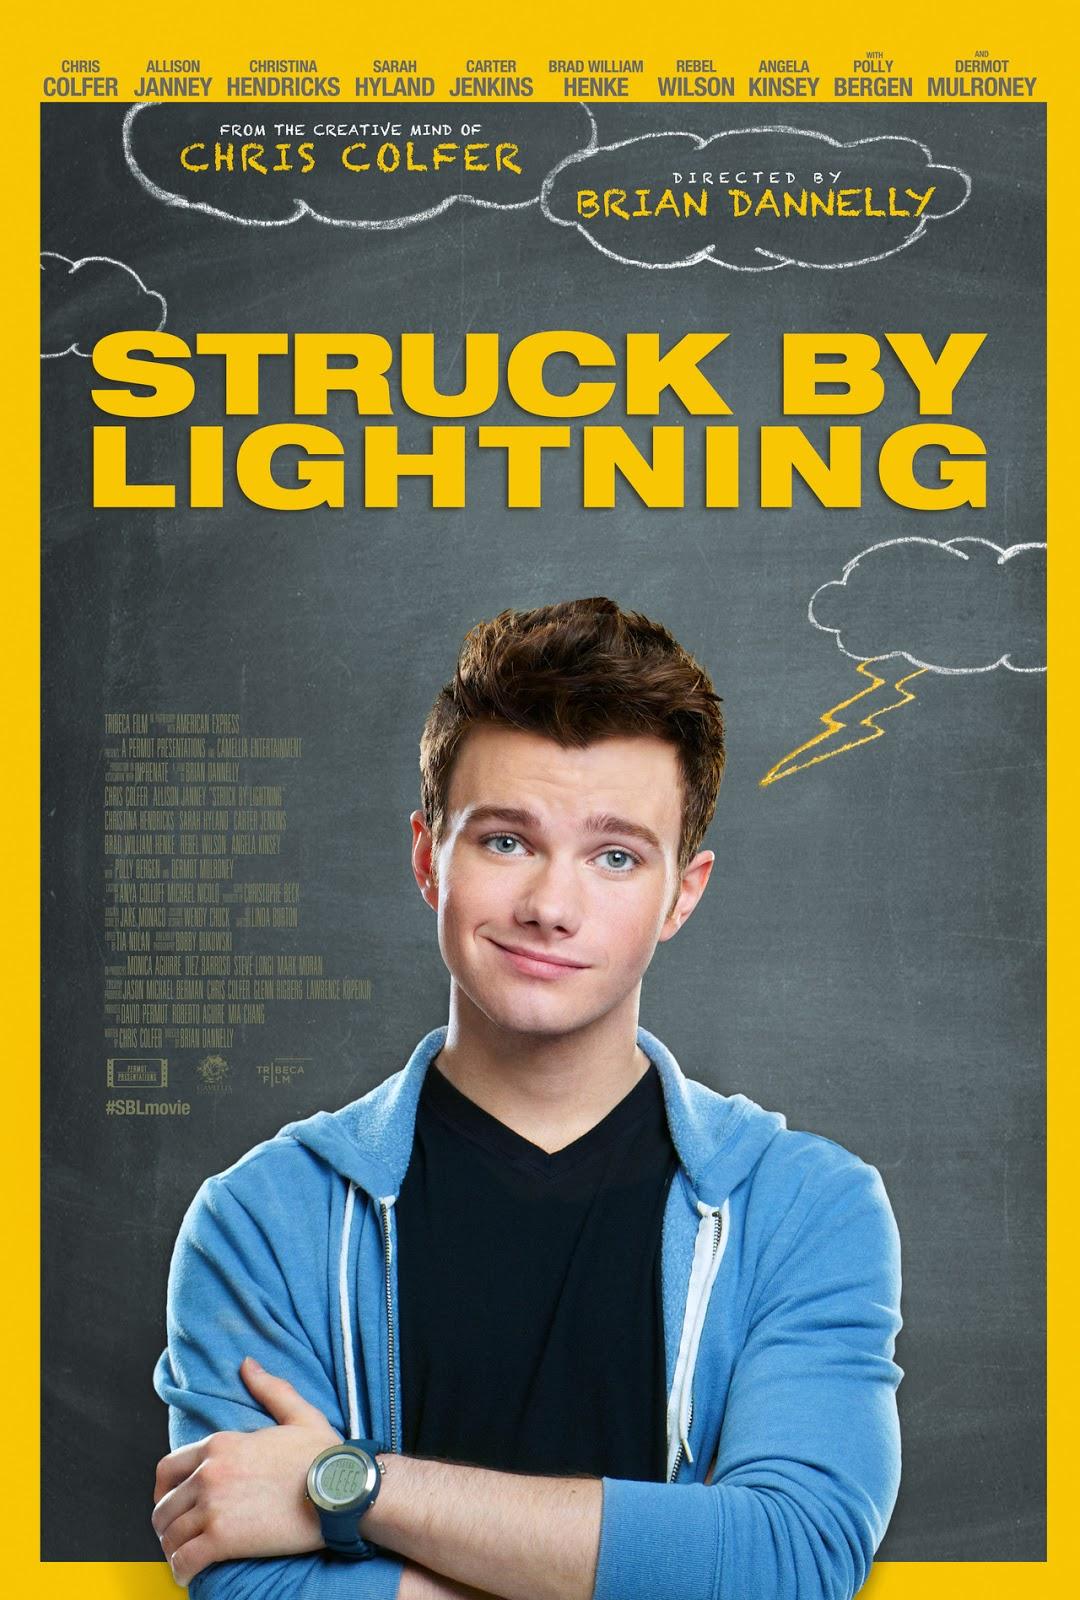 http://4.bp.blogspot.com/-6y8_4b_1edg/UR0gpX5Io1I/AAAAAAAAO8k/SdfTqR6HMCw/s1600/Struck+By+Lightning.jpg